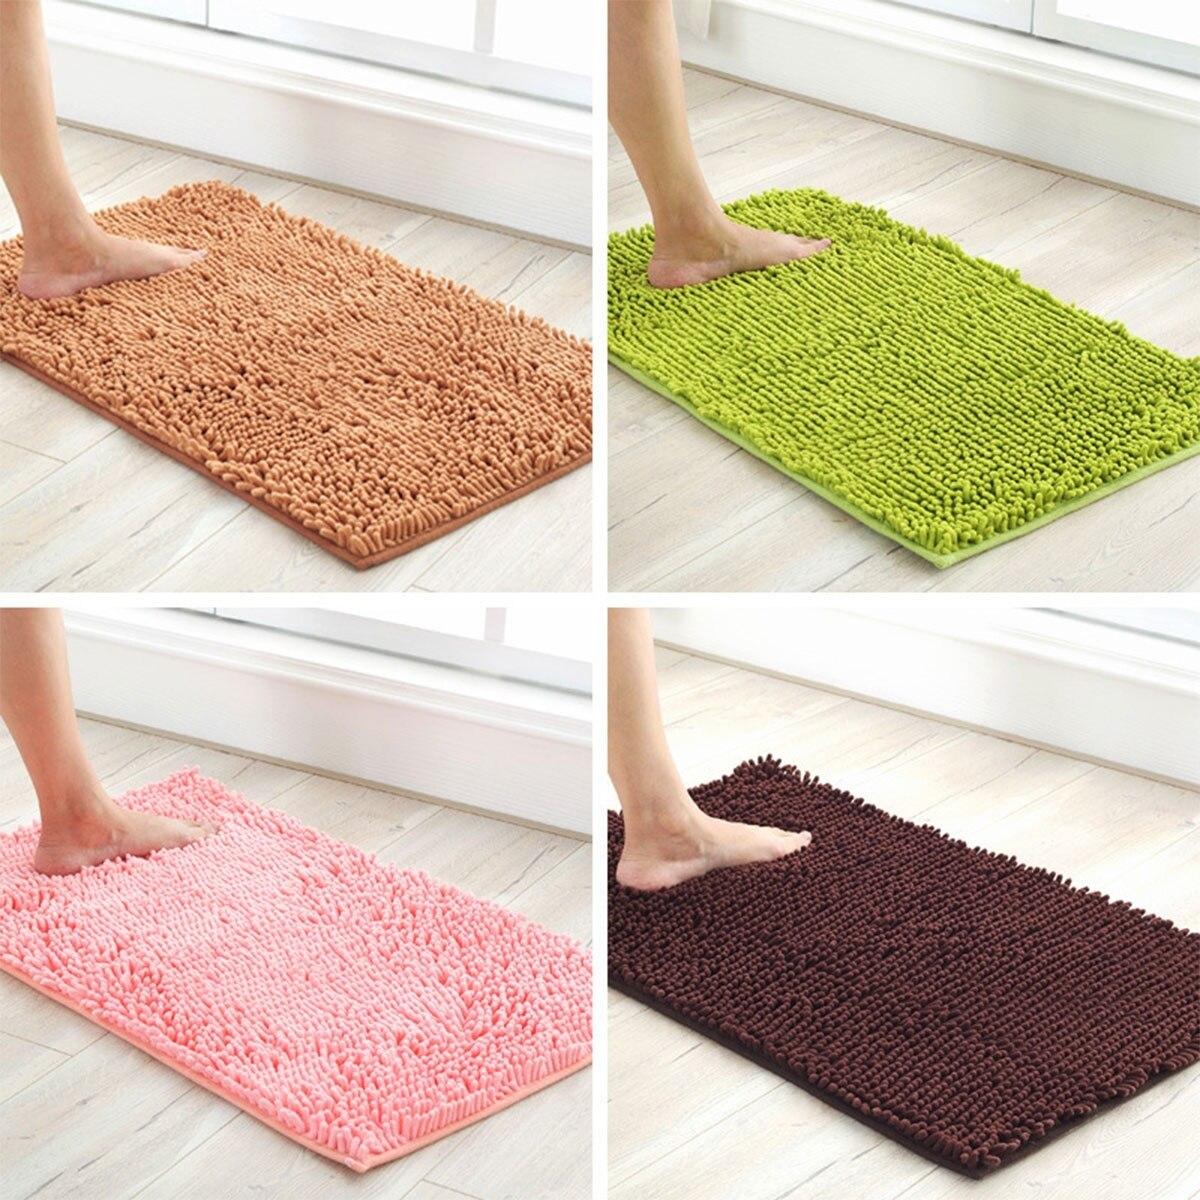 Soft Microfiber Shaggy Anti Slip Absorbent Bath Mat Bathroom Shower Rugs Carpet